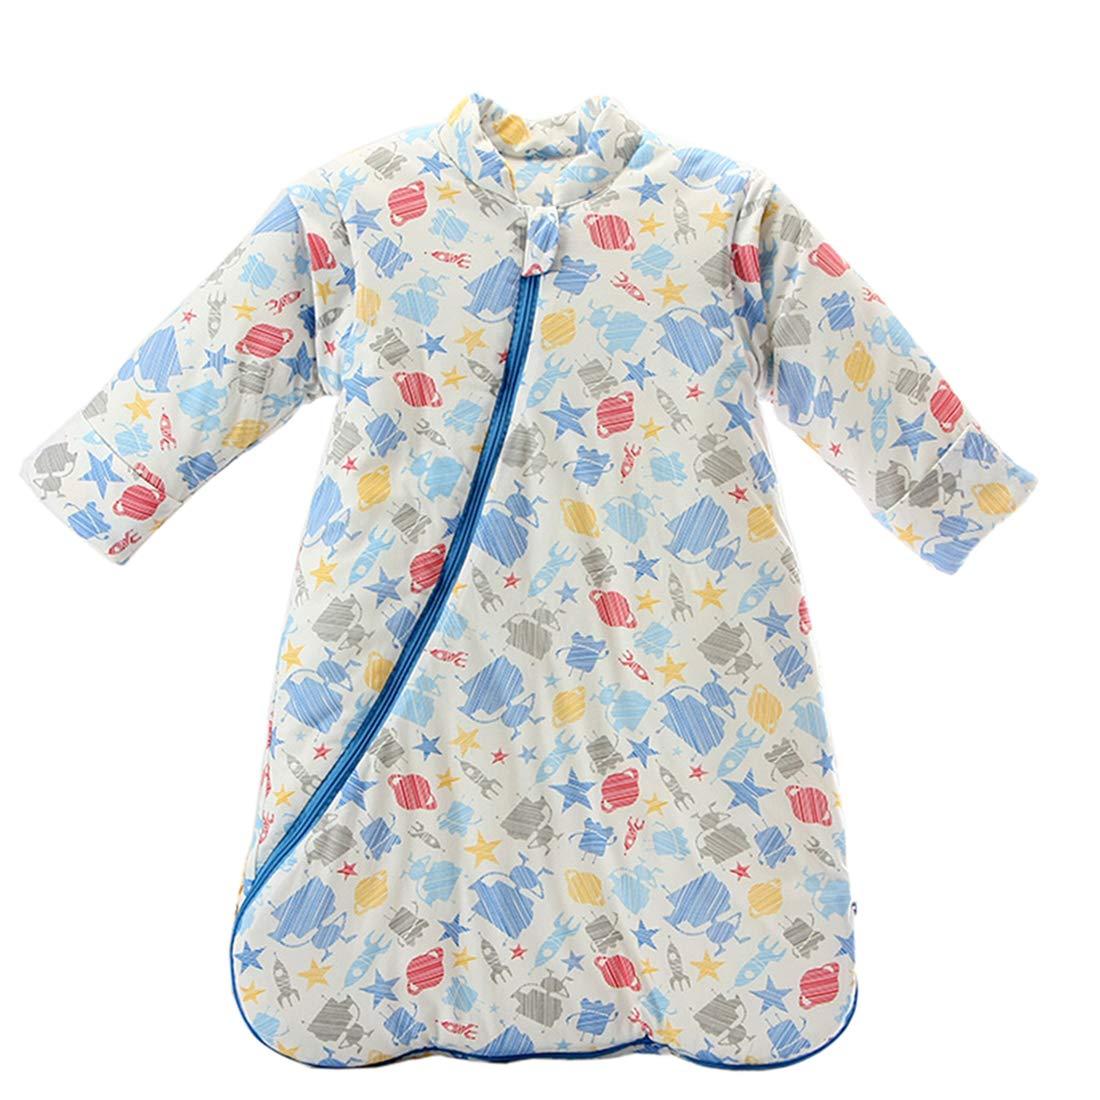 Fairy Baby Newborn Unisex Winter Thick Sleepsack Cartoon Bunting Bag Wearable Blanket size 0-12M Animal World Thickening